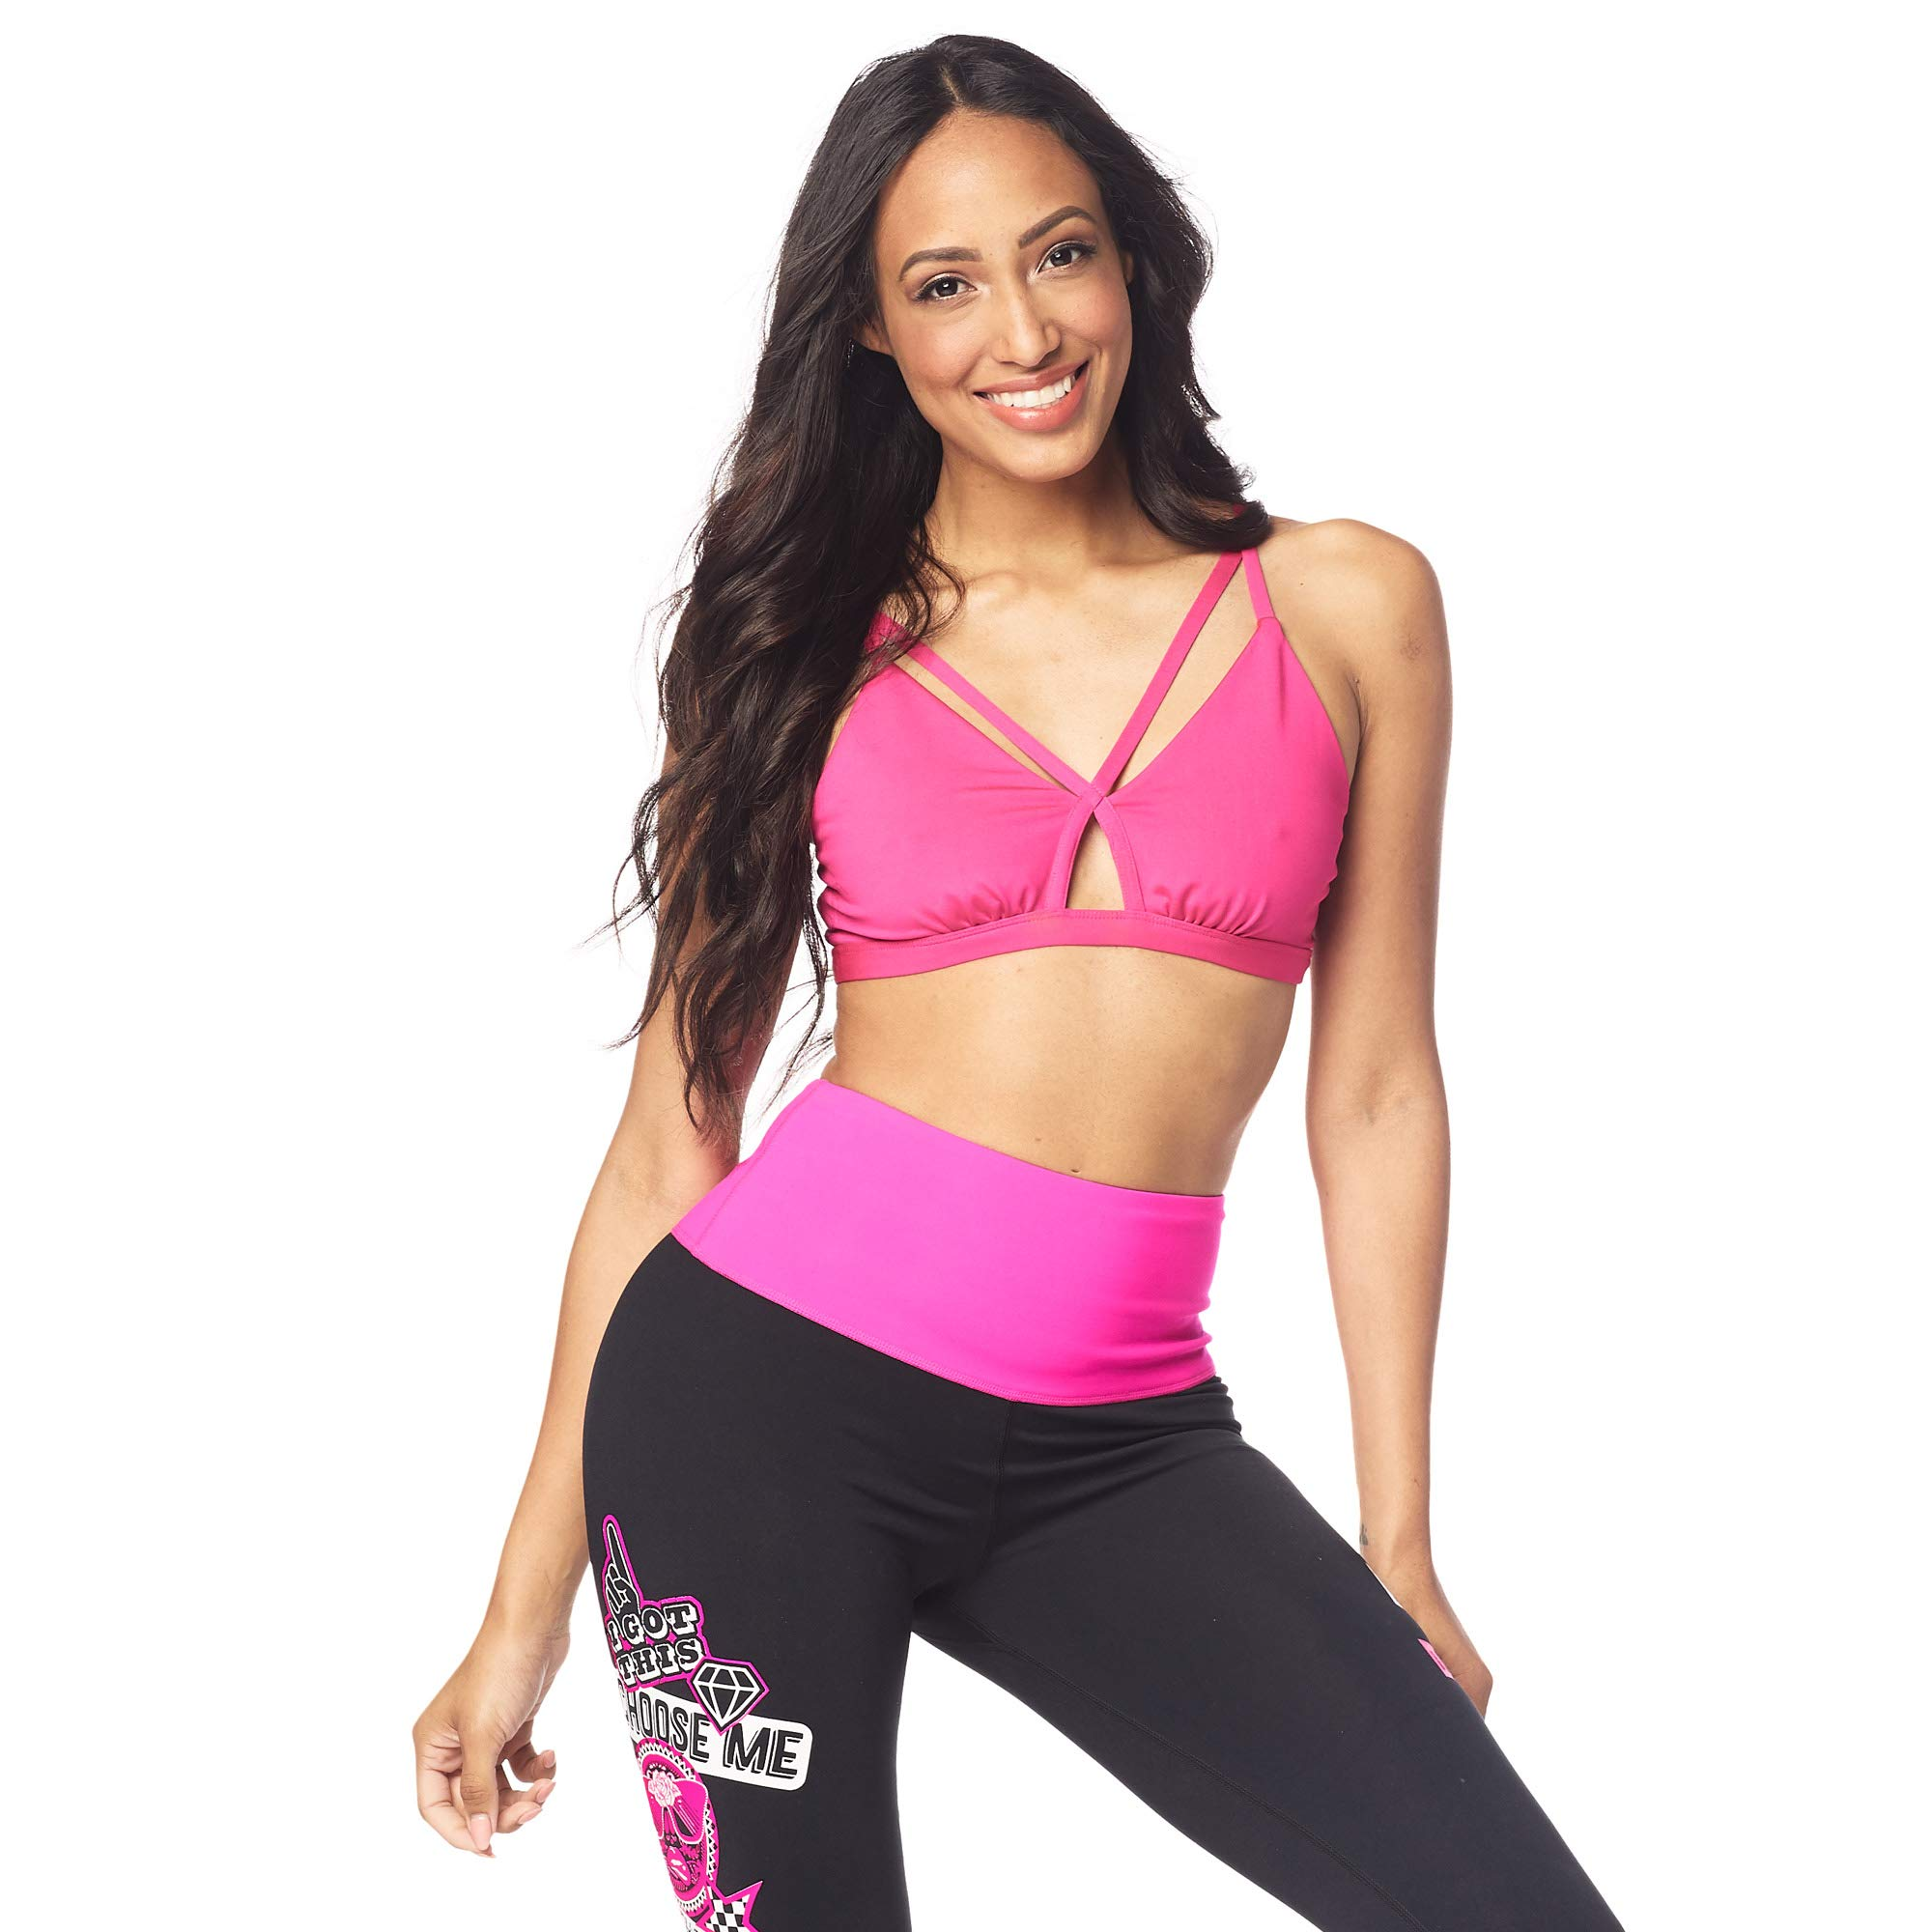 Zumba Women's Women's Activewear Fashion Print Bralette with Straps, Pink Shocking, X-Small